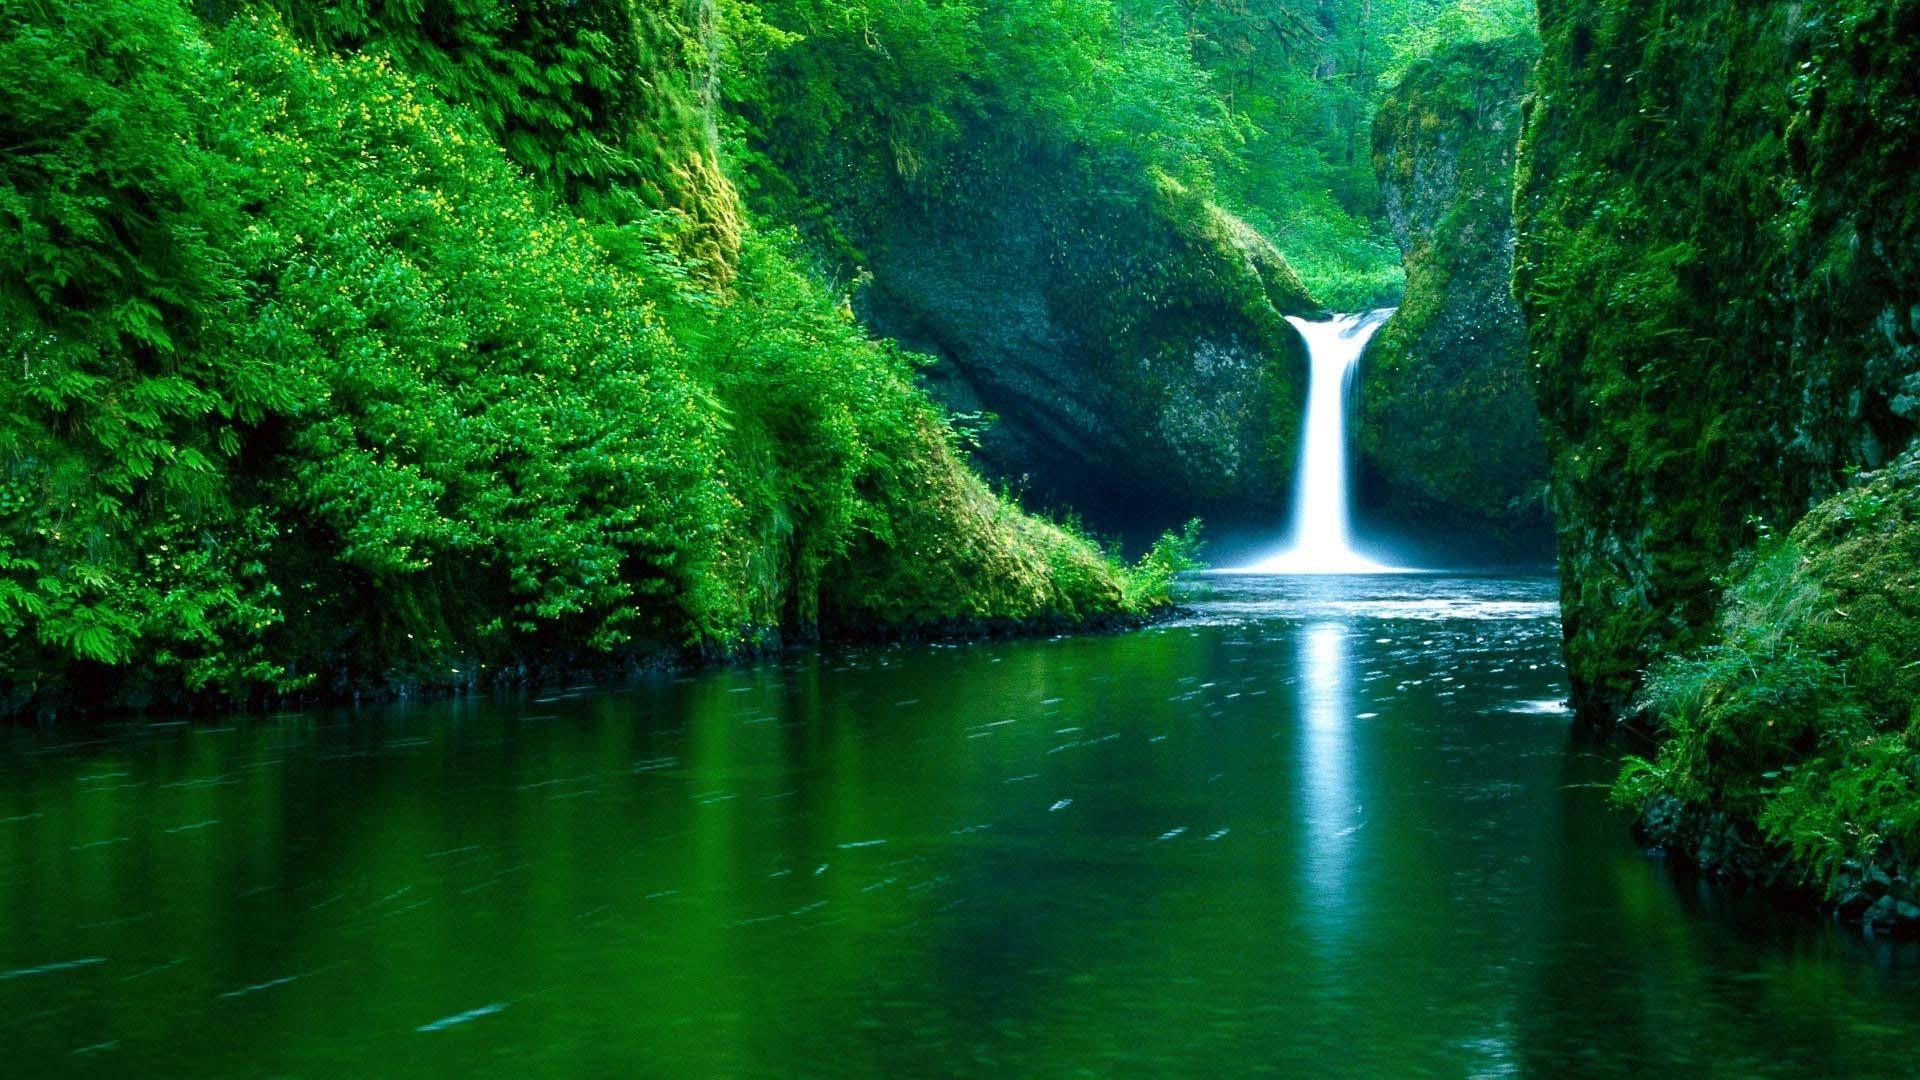 Beautiful nature wallpaper hd